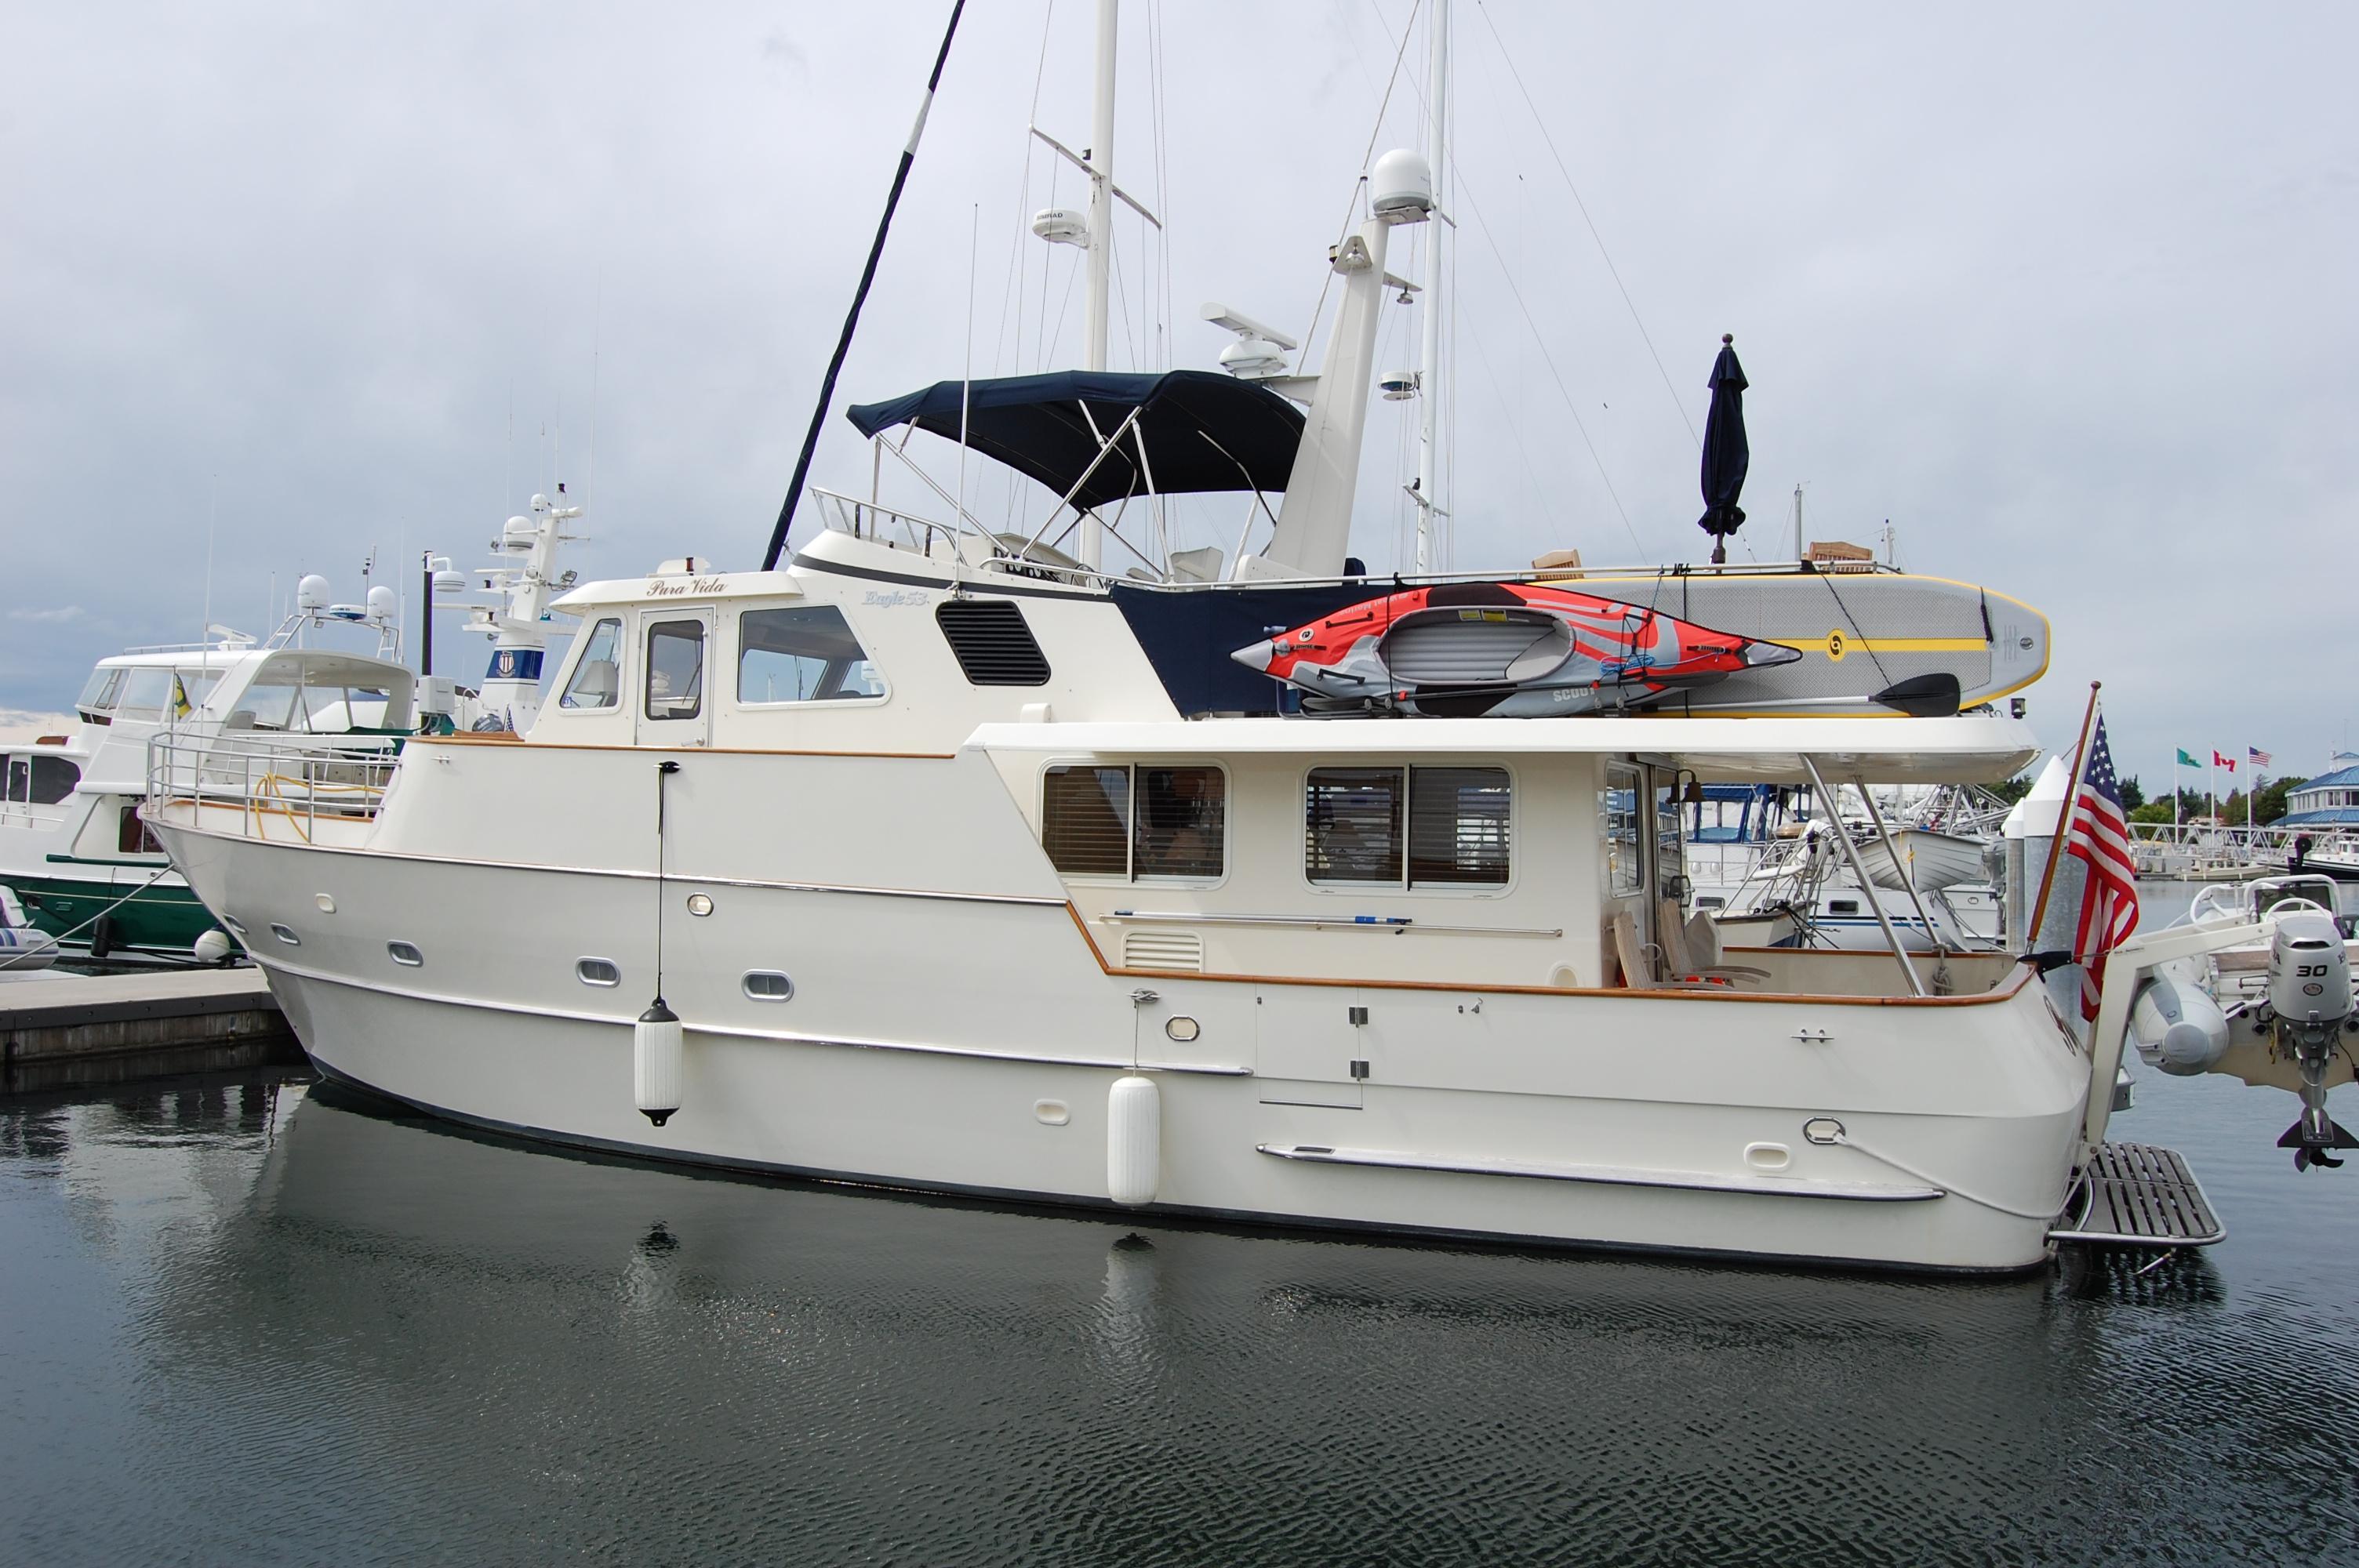 2002 Eagle Pilothouse Power Boat For Sale Wwwyachtworldcom